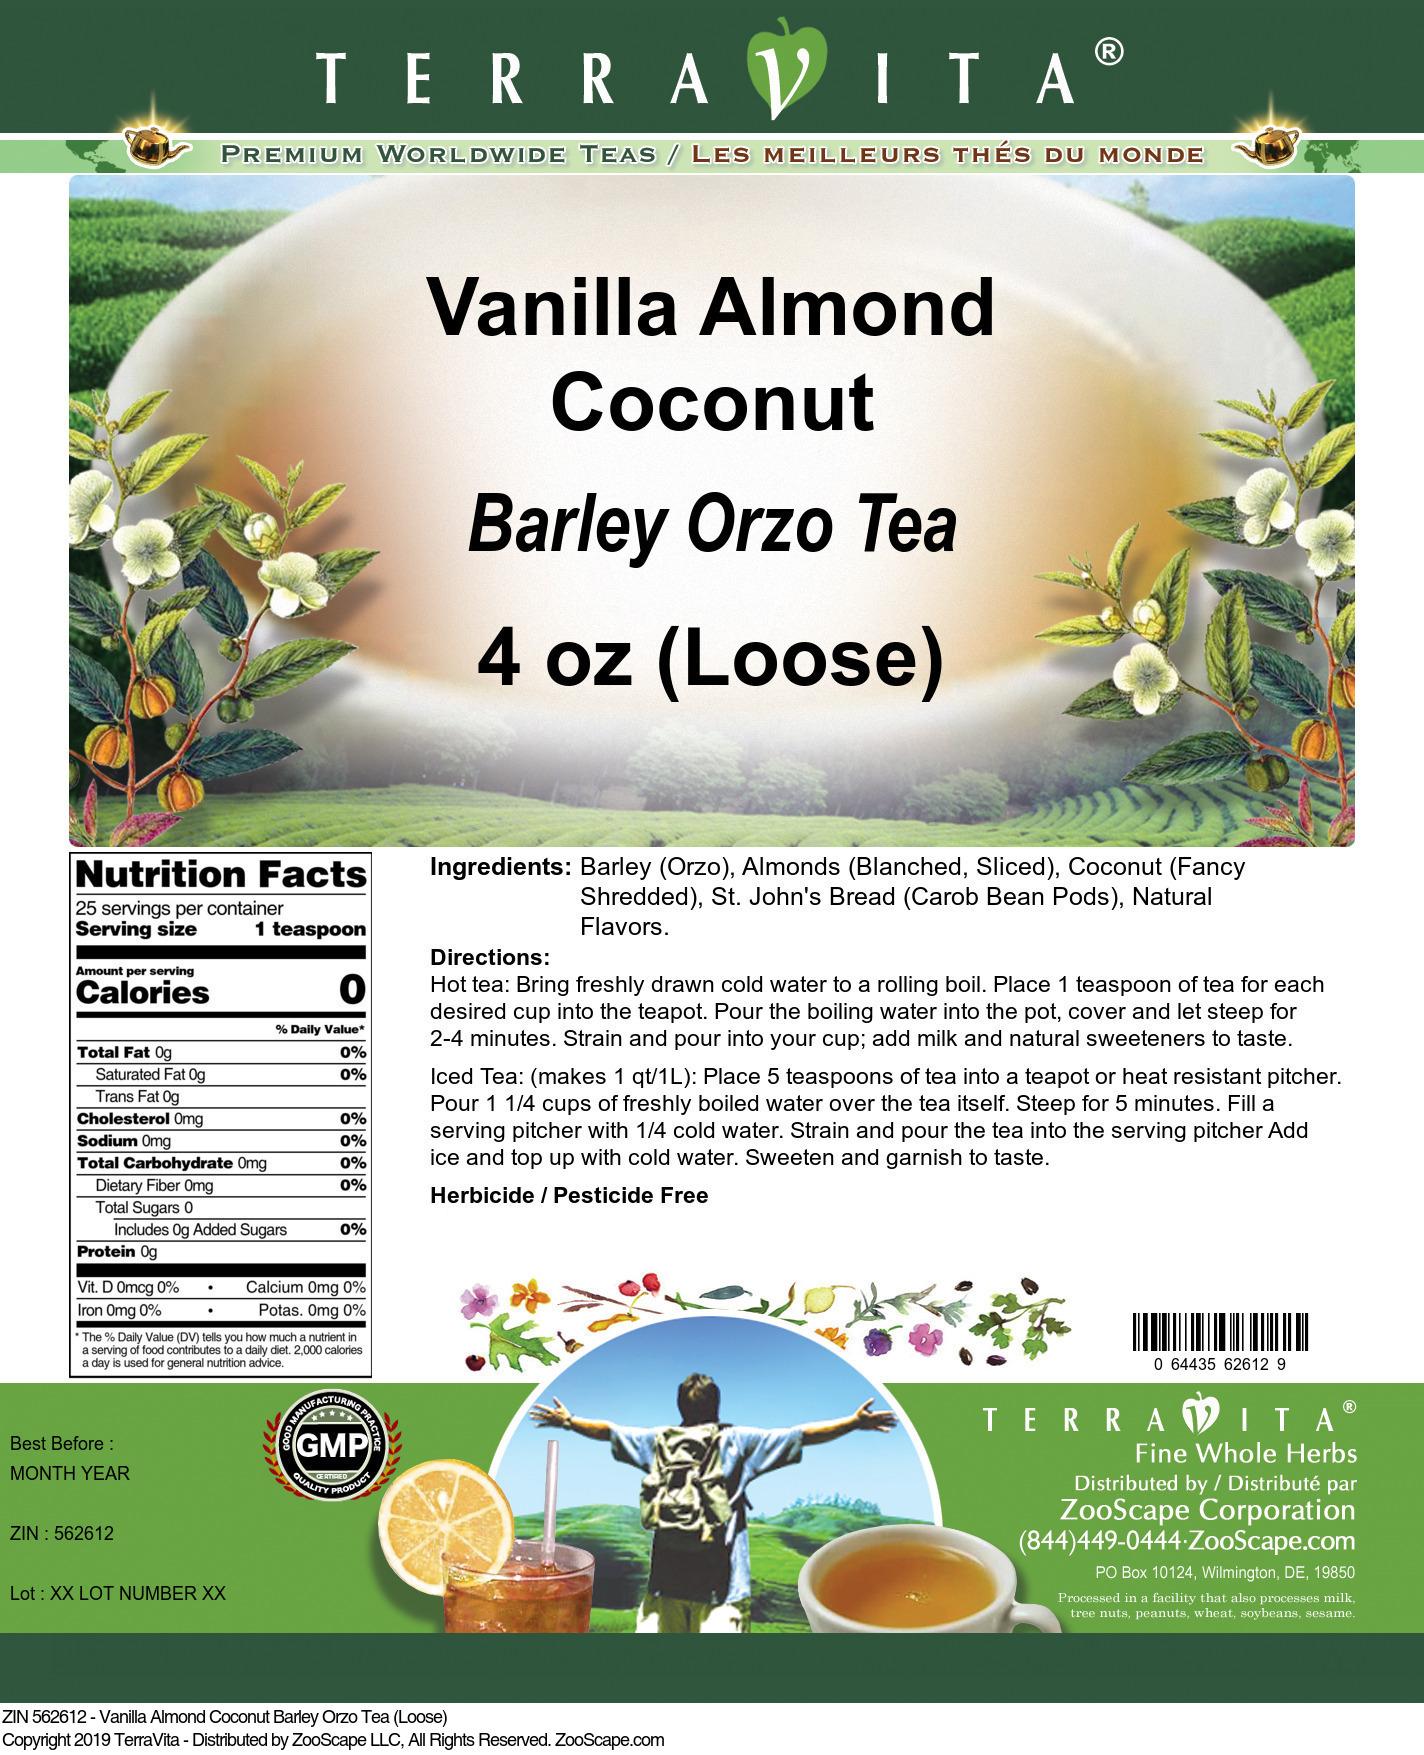 Vanilla Almond Coconut Barley Orzo Tea (Loose)